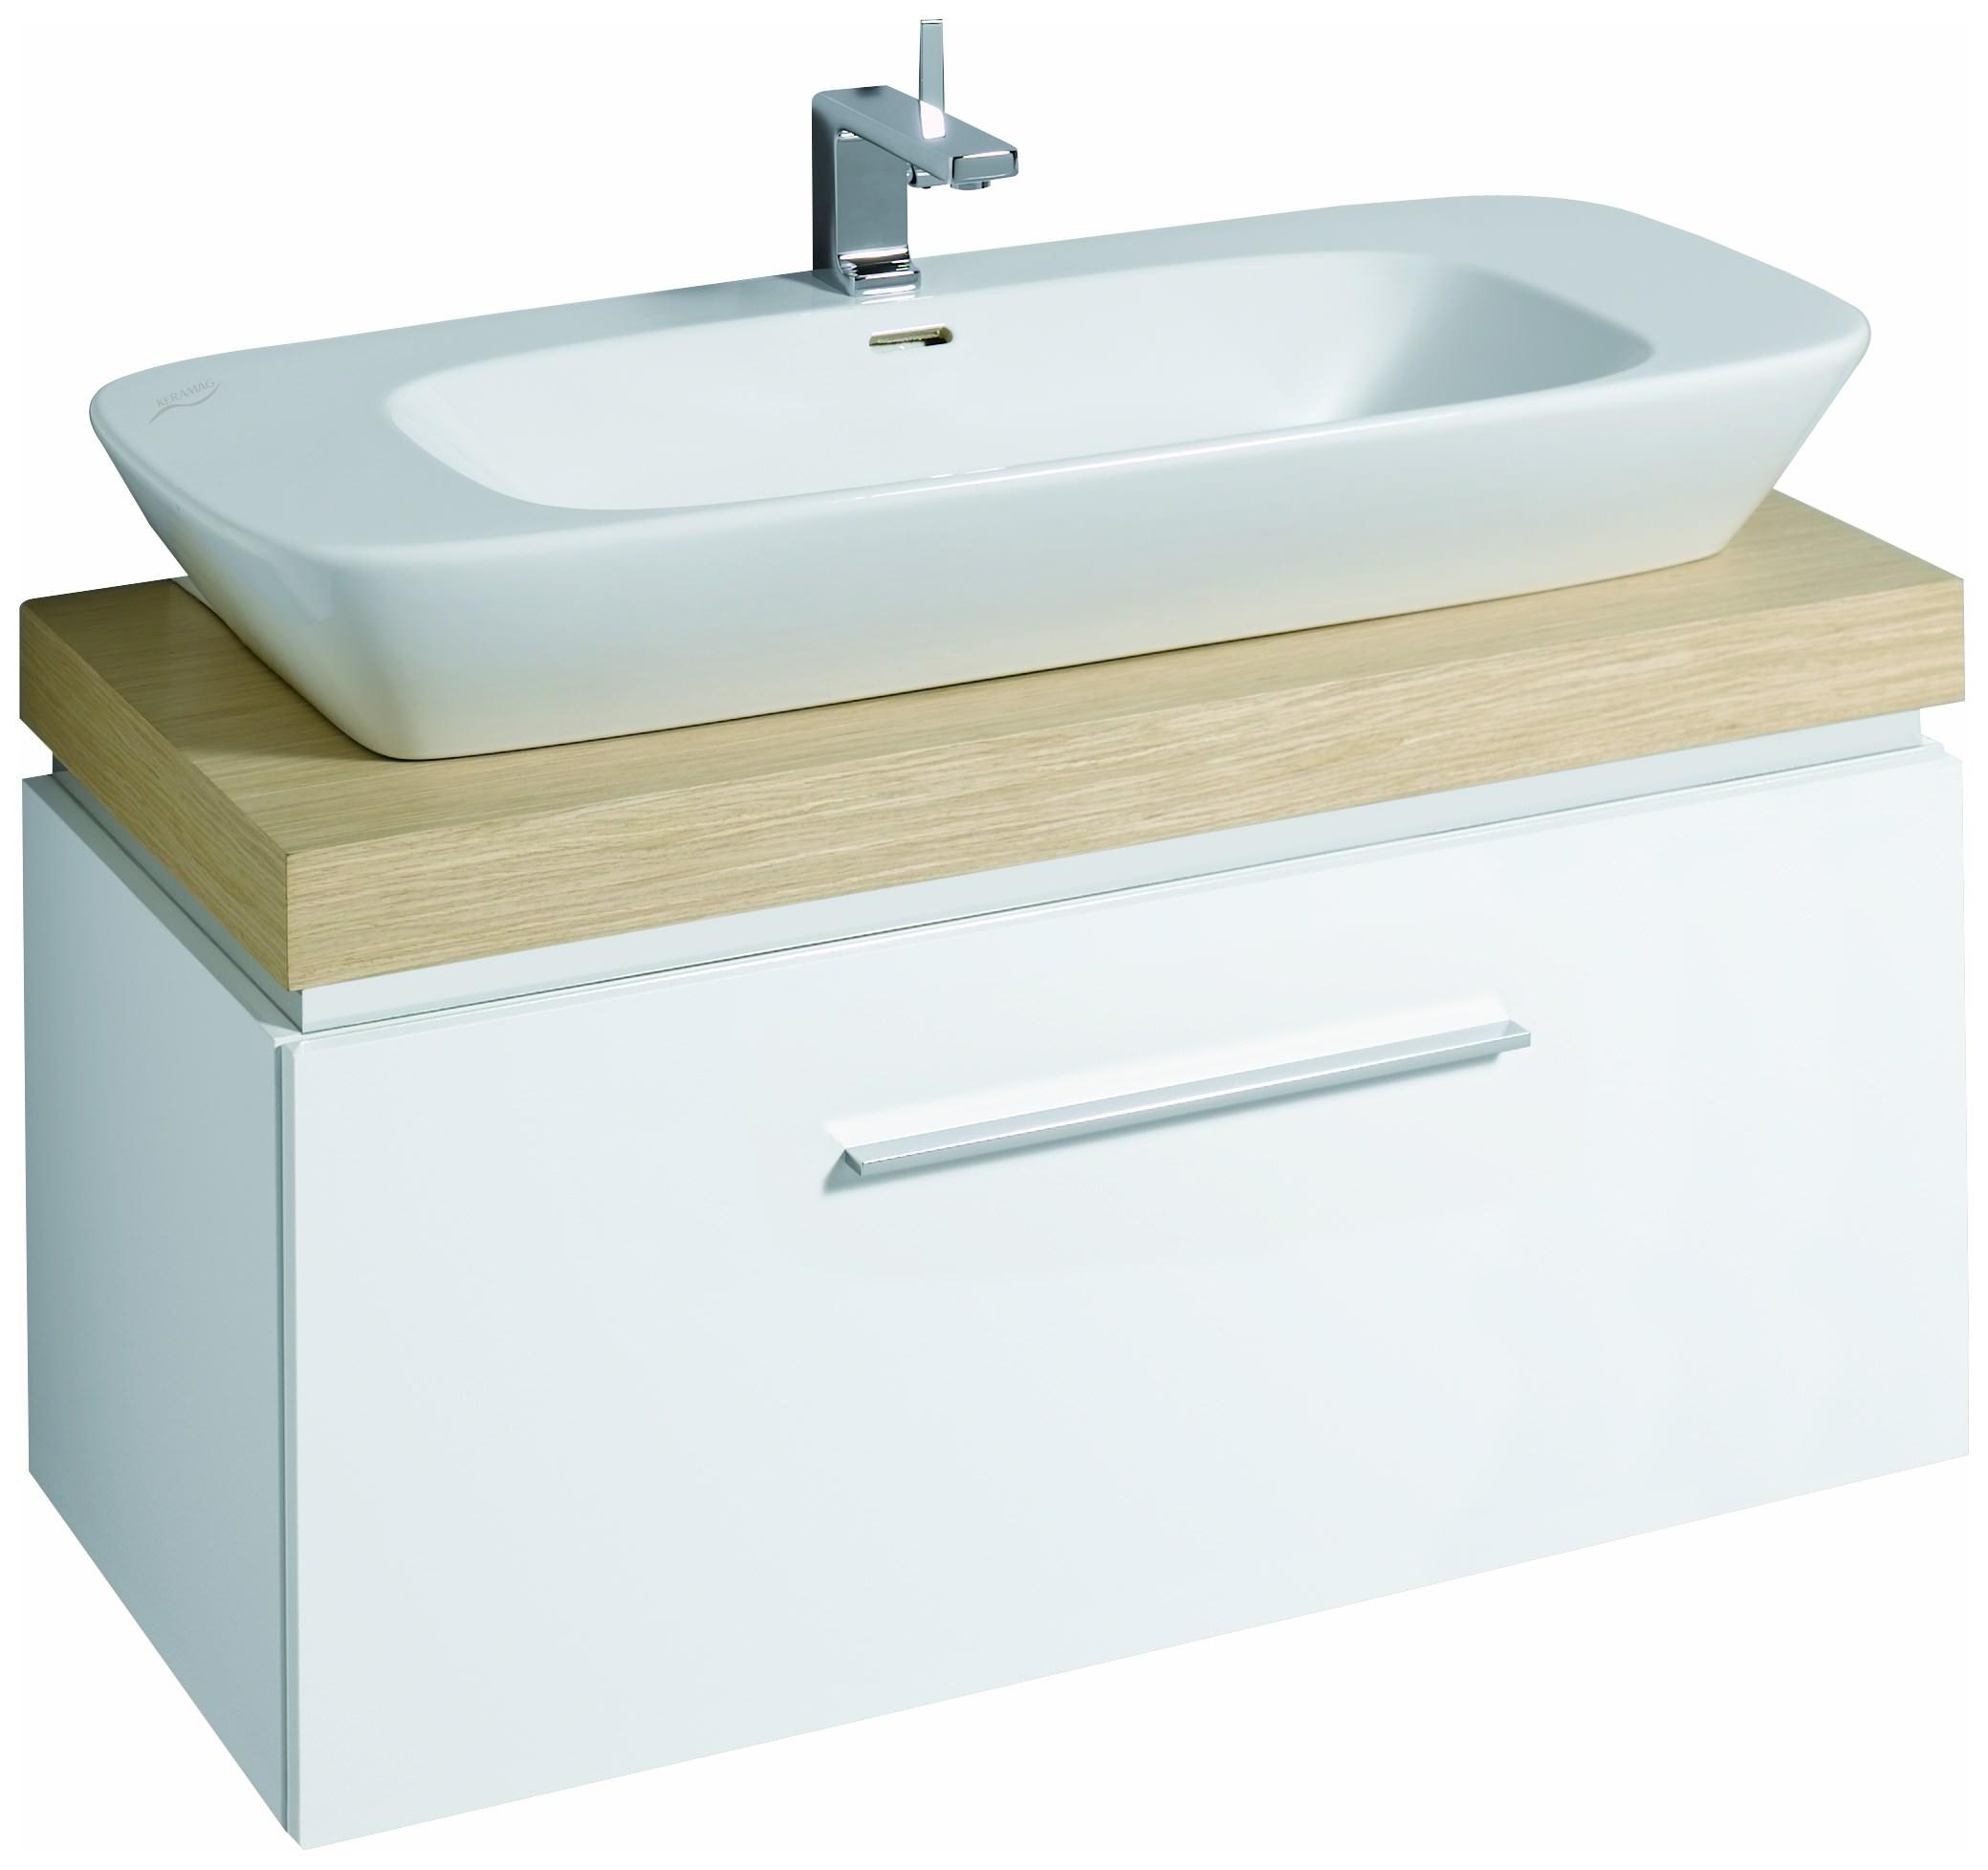 keramag silk waschtischunterschrank 816012 1000x400x470mm. Black Bedroom Furniture Sets. Home Design Ideas